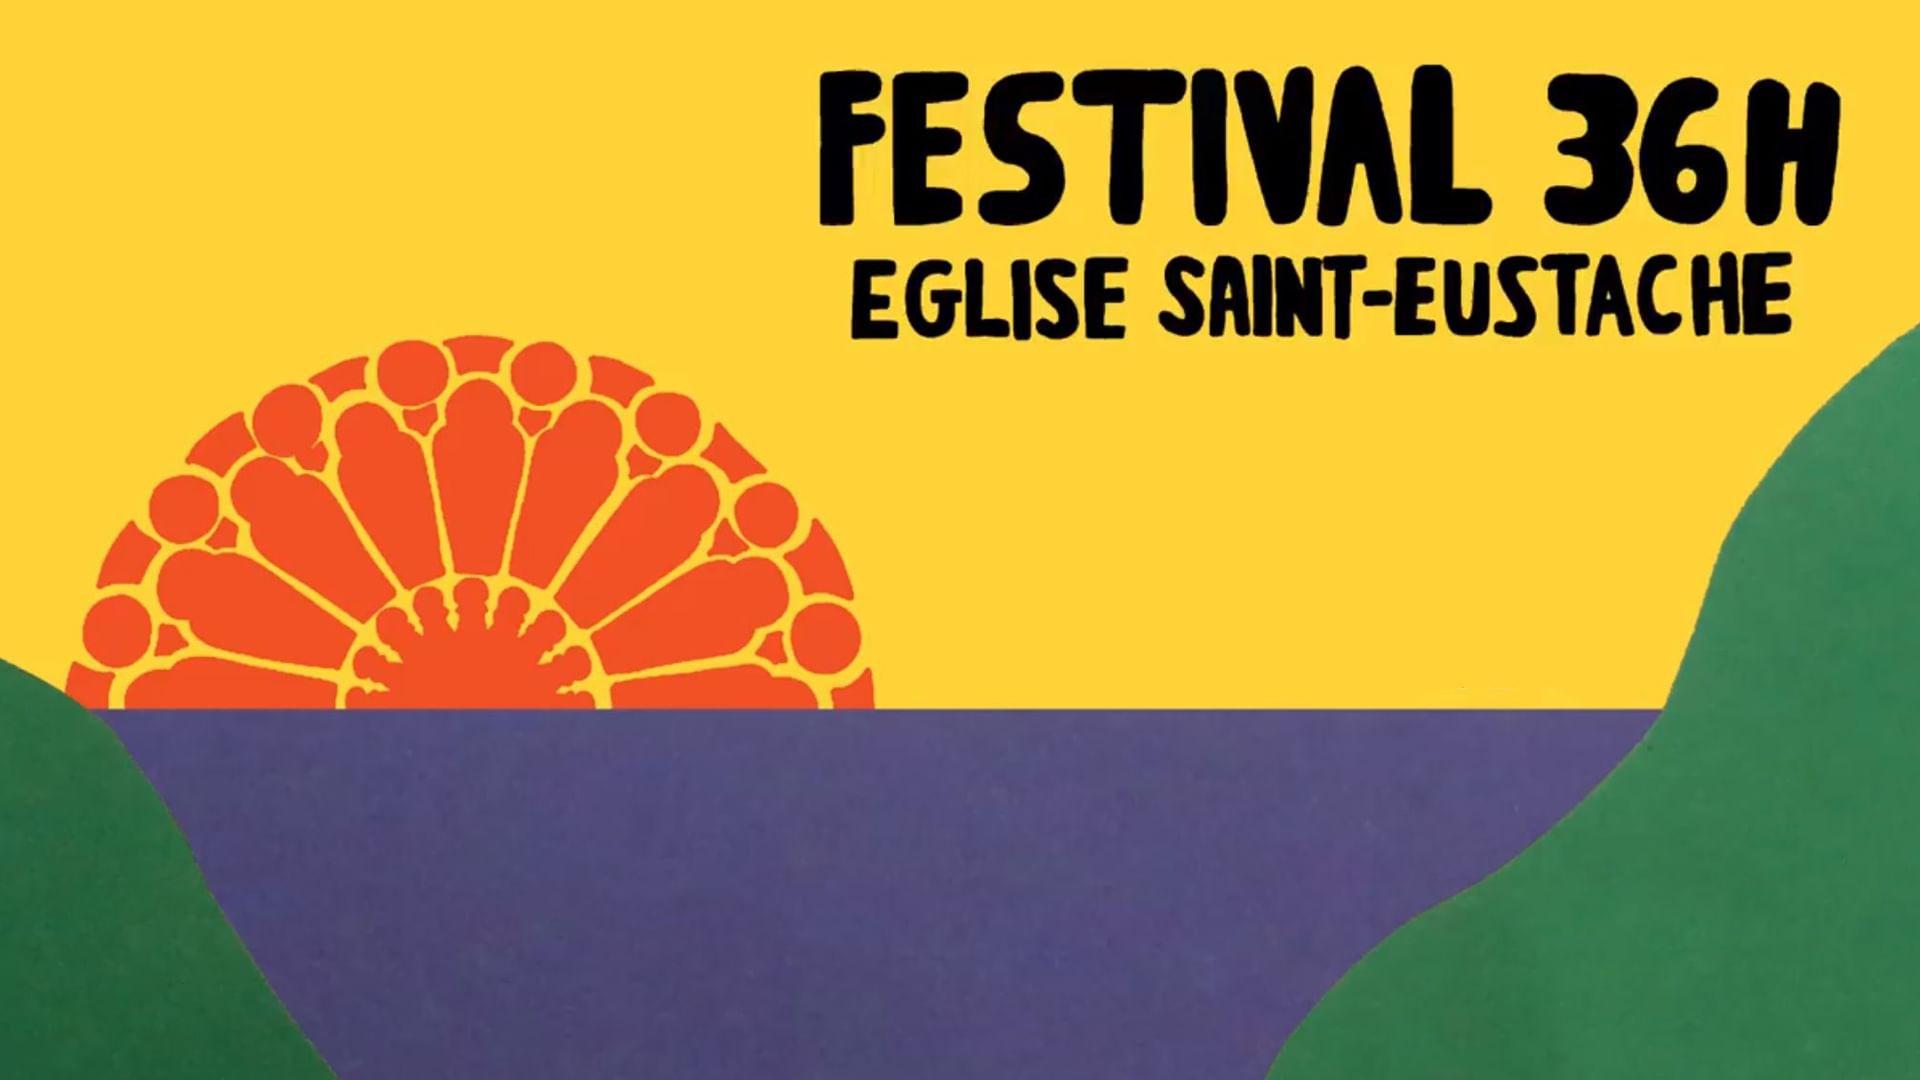 Festival 36h Saint-Eustache